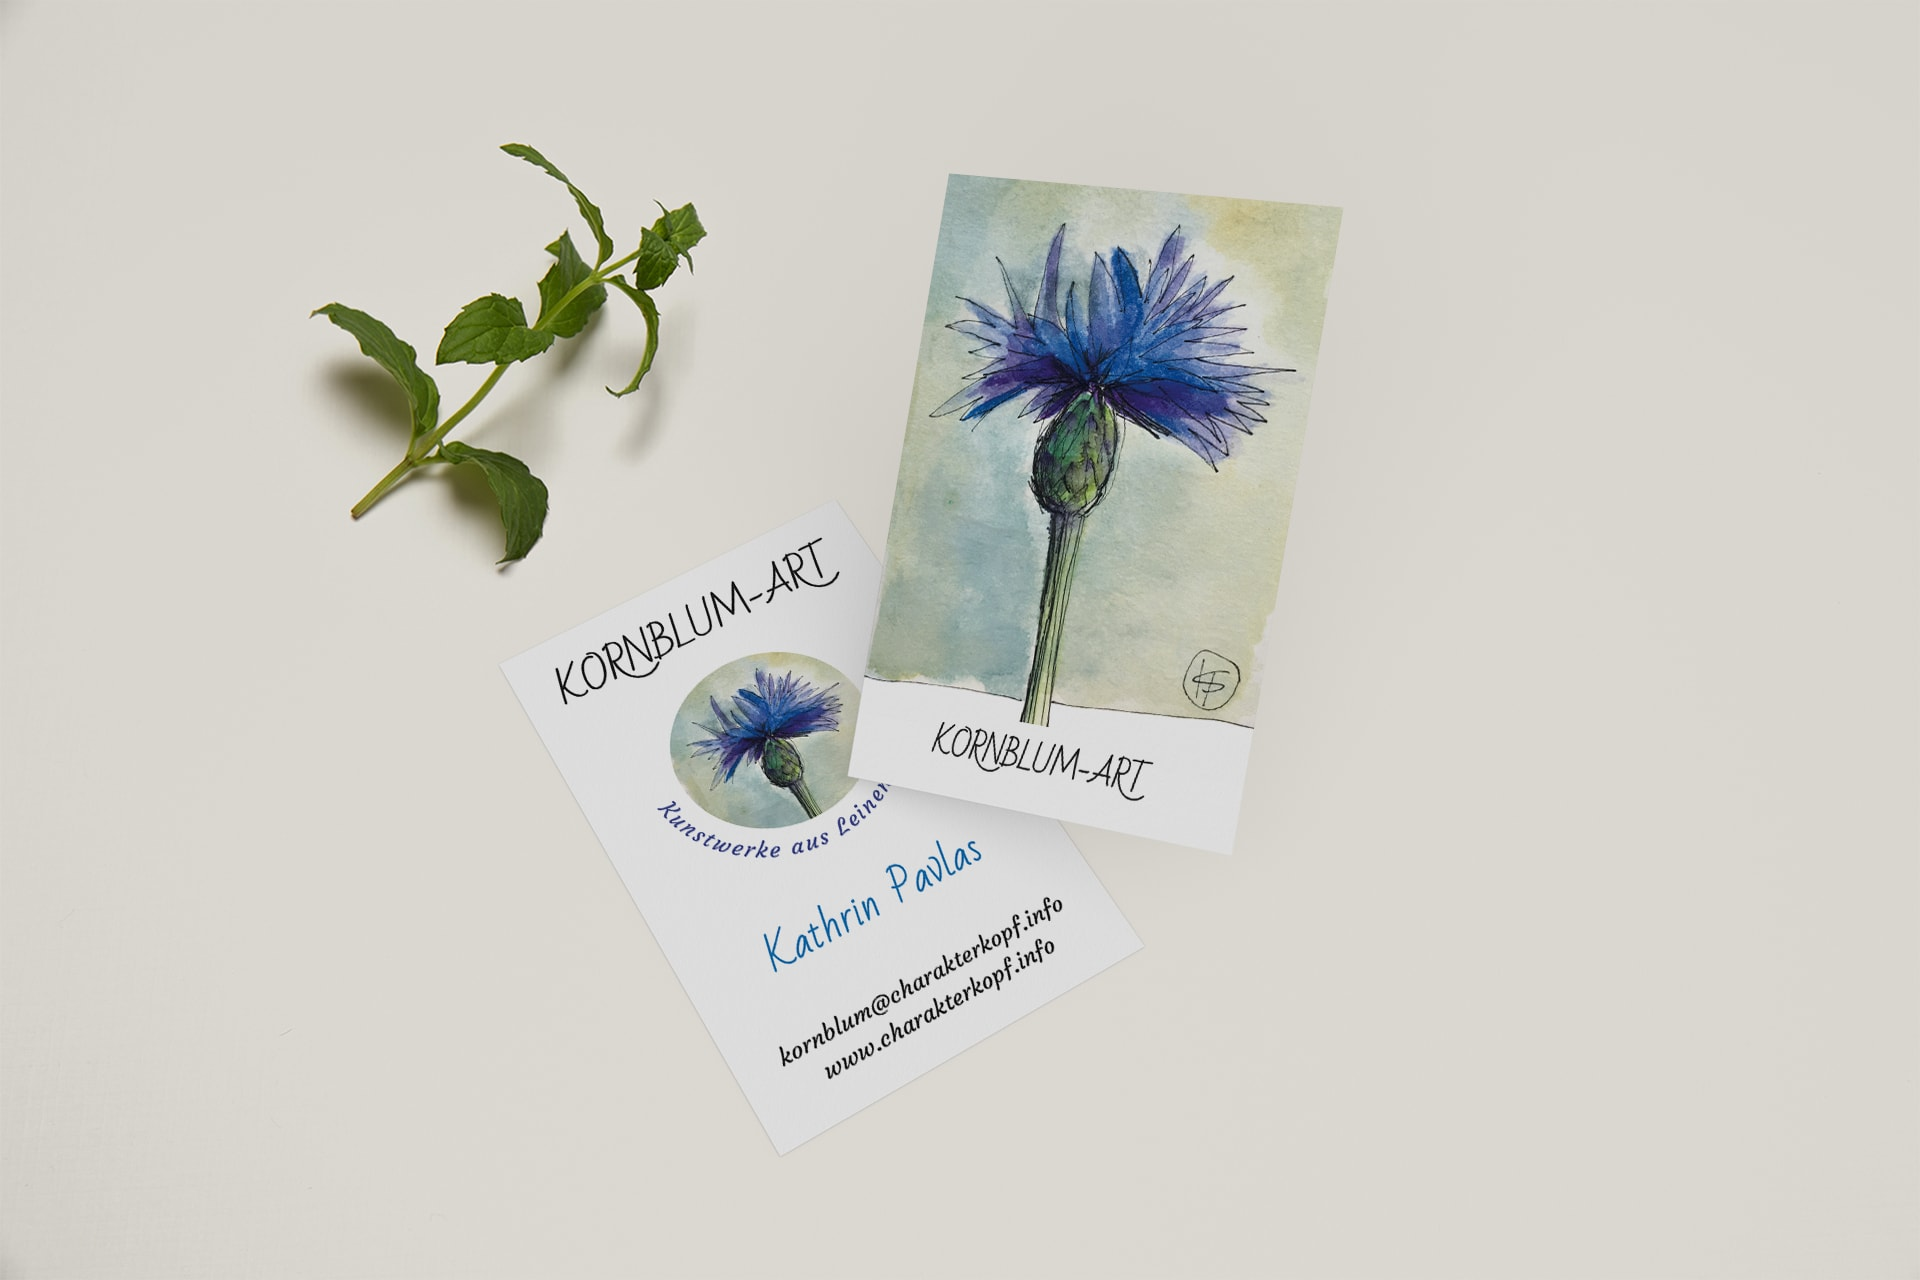 Visitenkarten – Kornblumart, Elementardesign